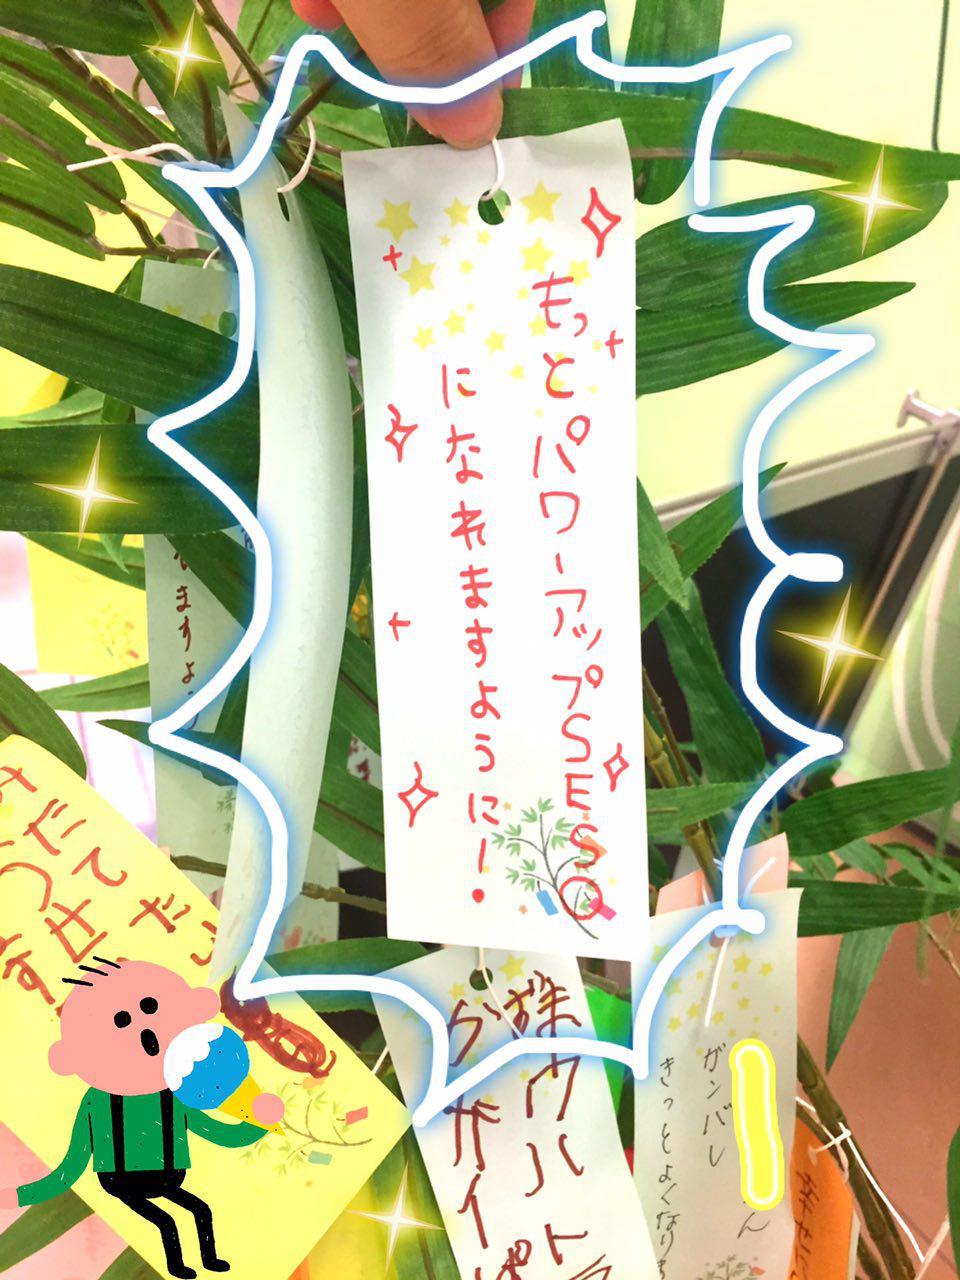 photo_2017-06-30_00-19-09.jpg